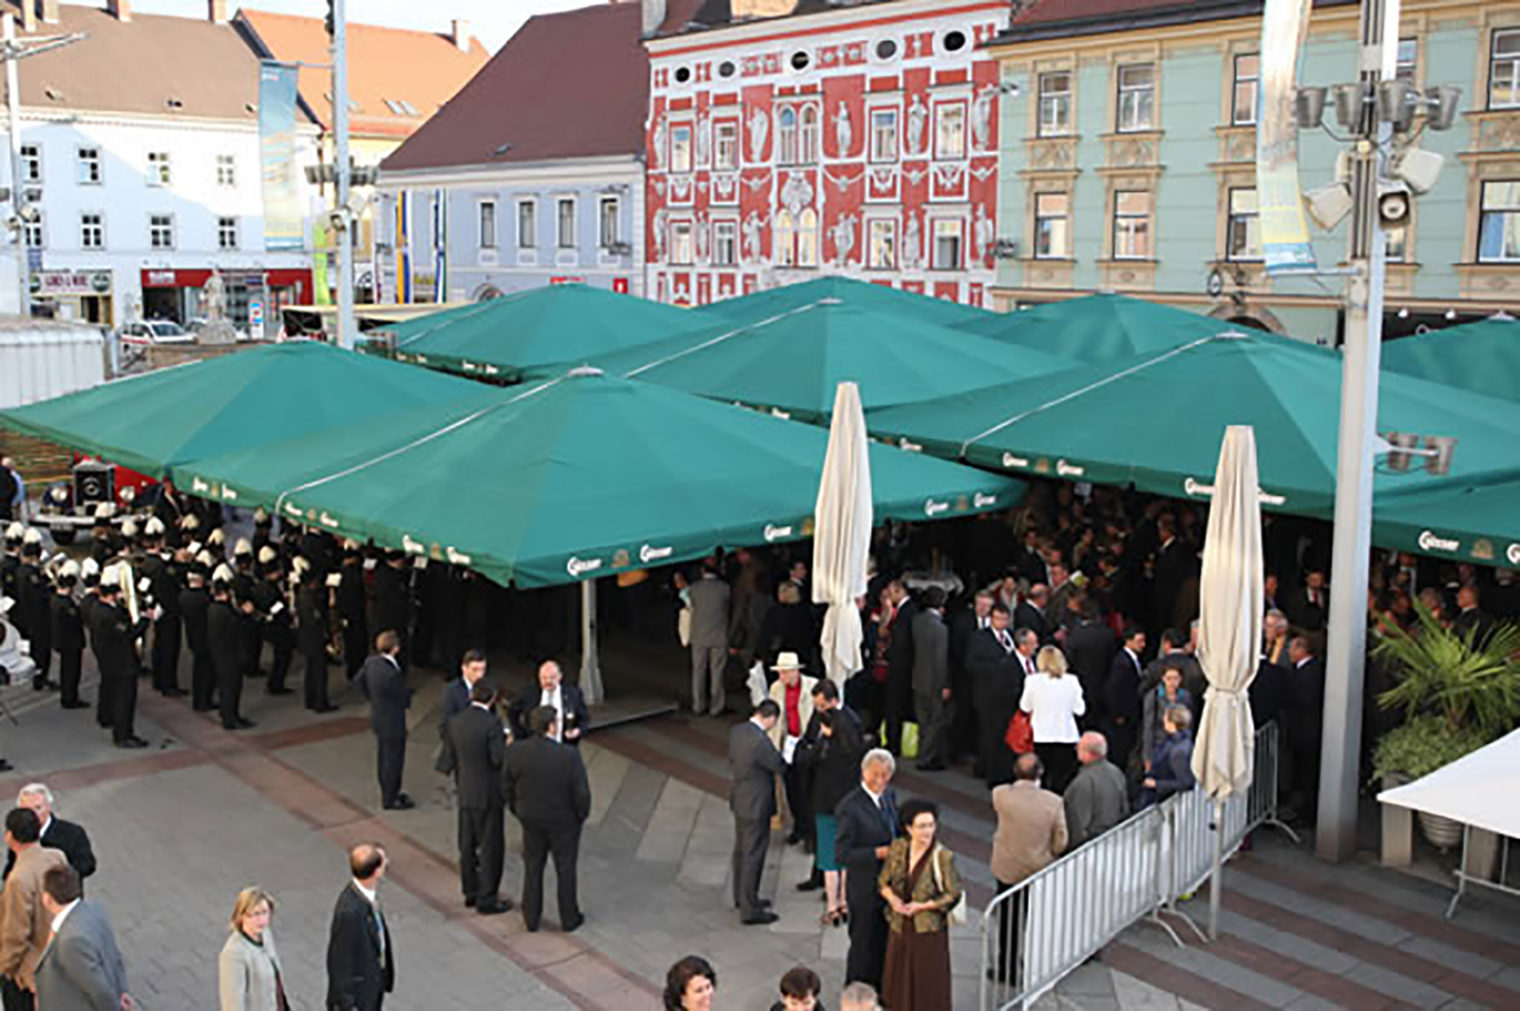 Veranstaltung am Hauptplatz Leoben